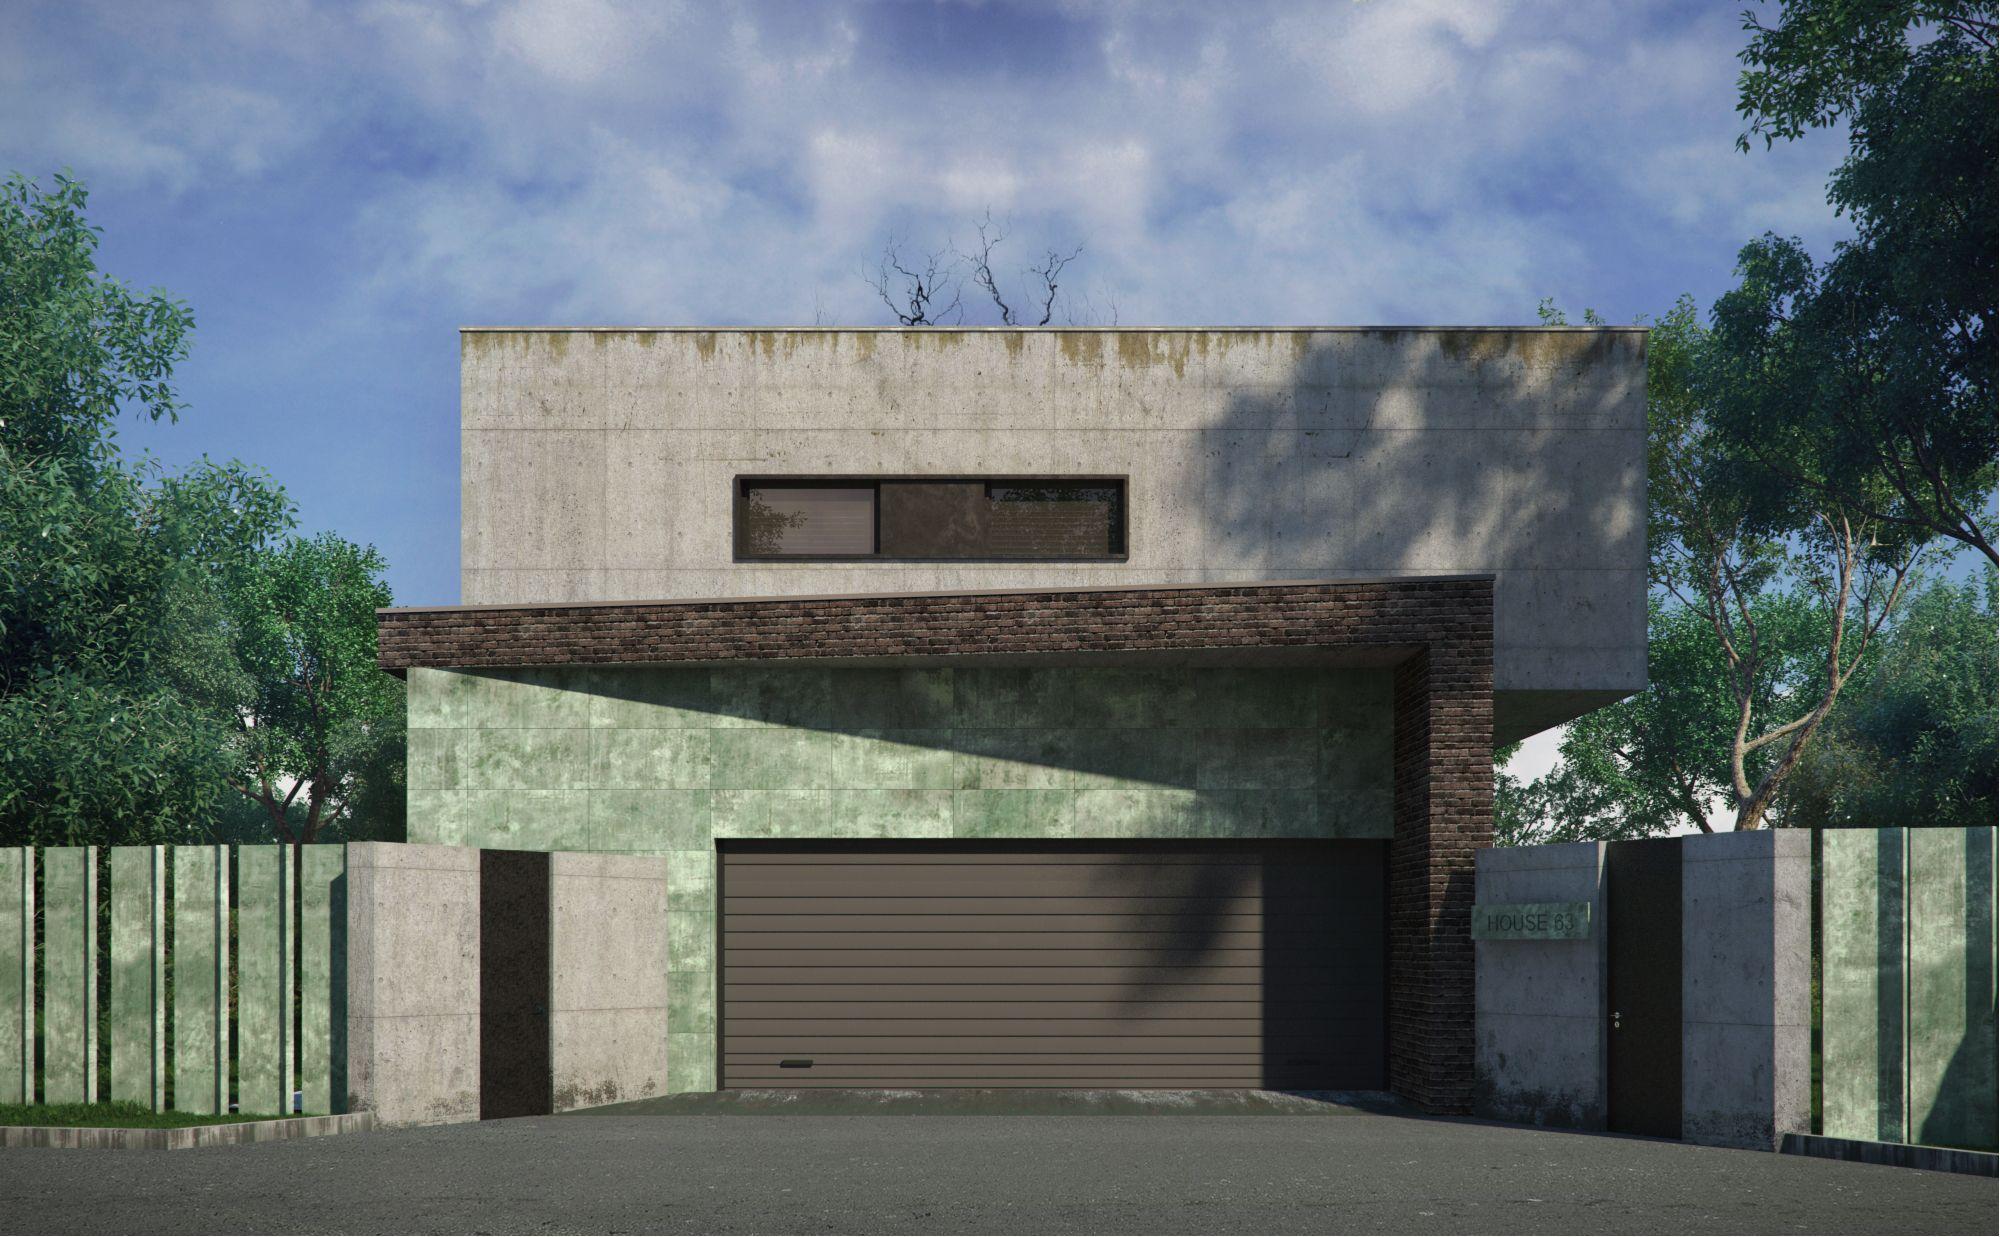 Casa de campo na aldeia Bremen 300 m., gabinete de arquitectos Alexandra Fedorova